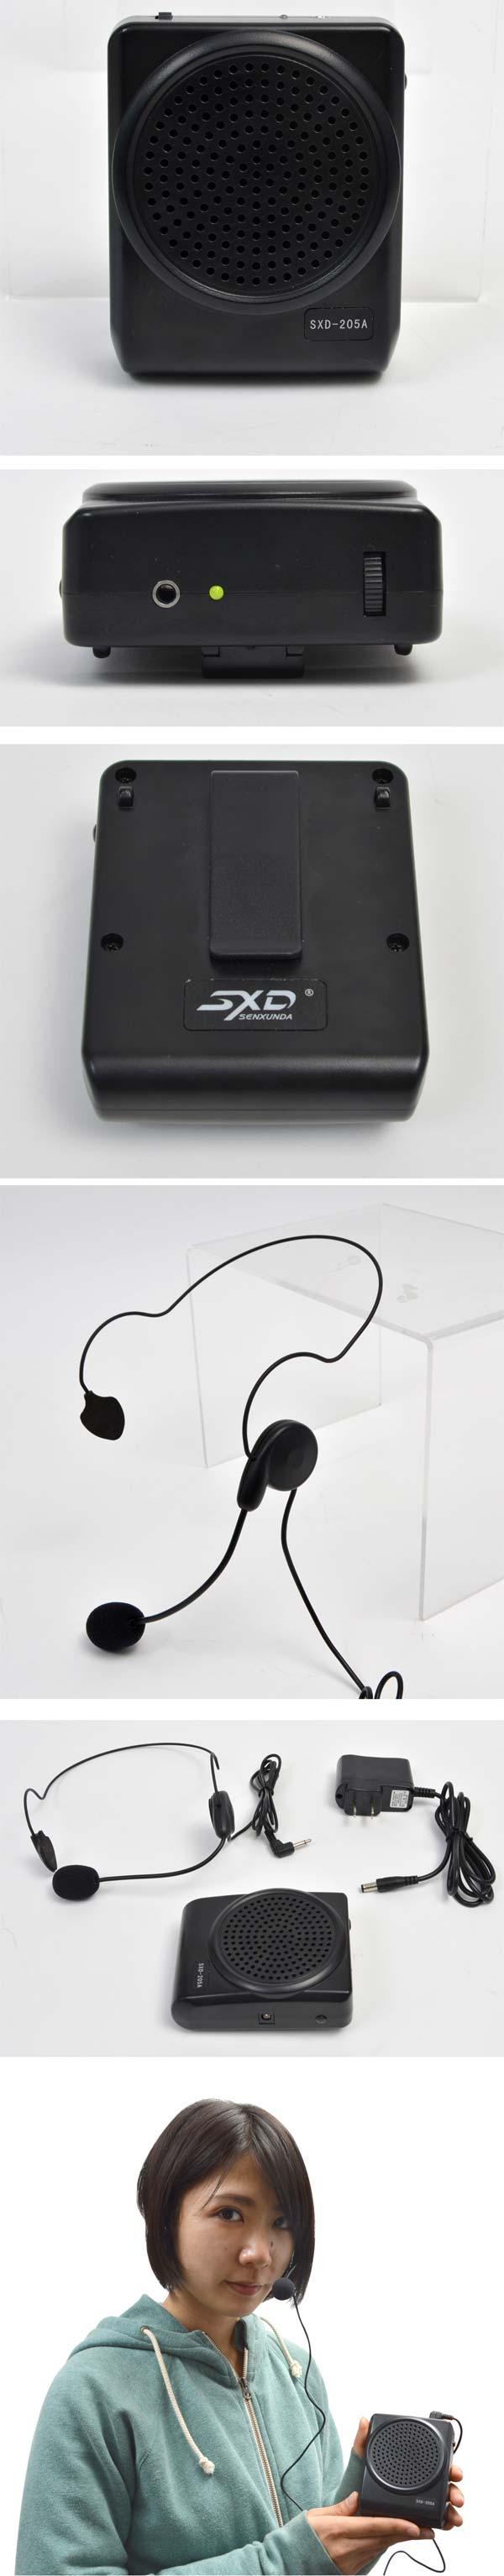 Аппарат Niji-iro Voice Changer Z от Thanko позволяет